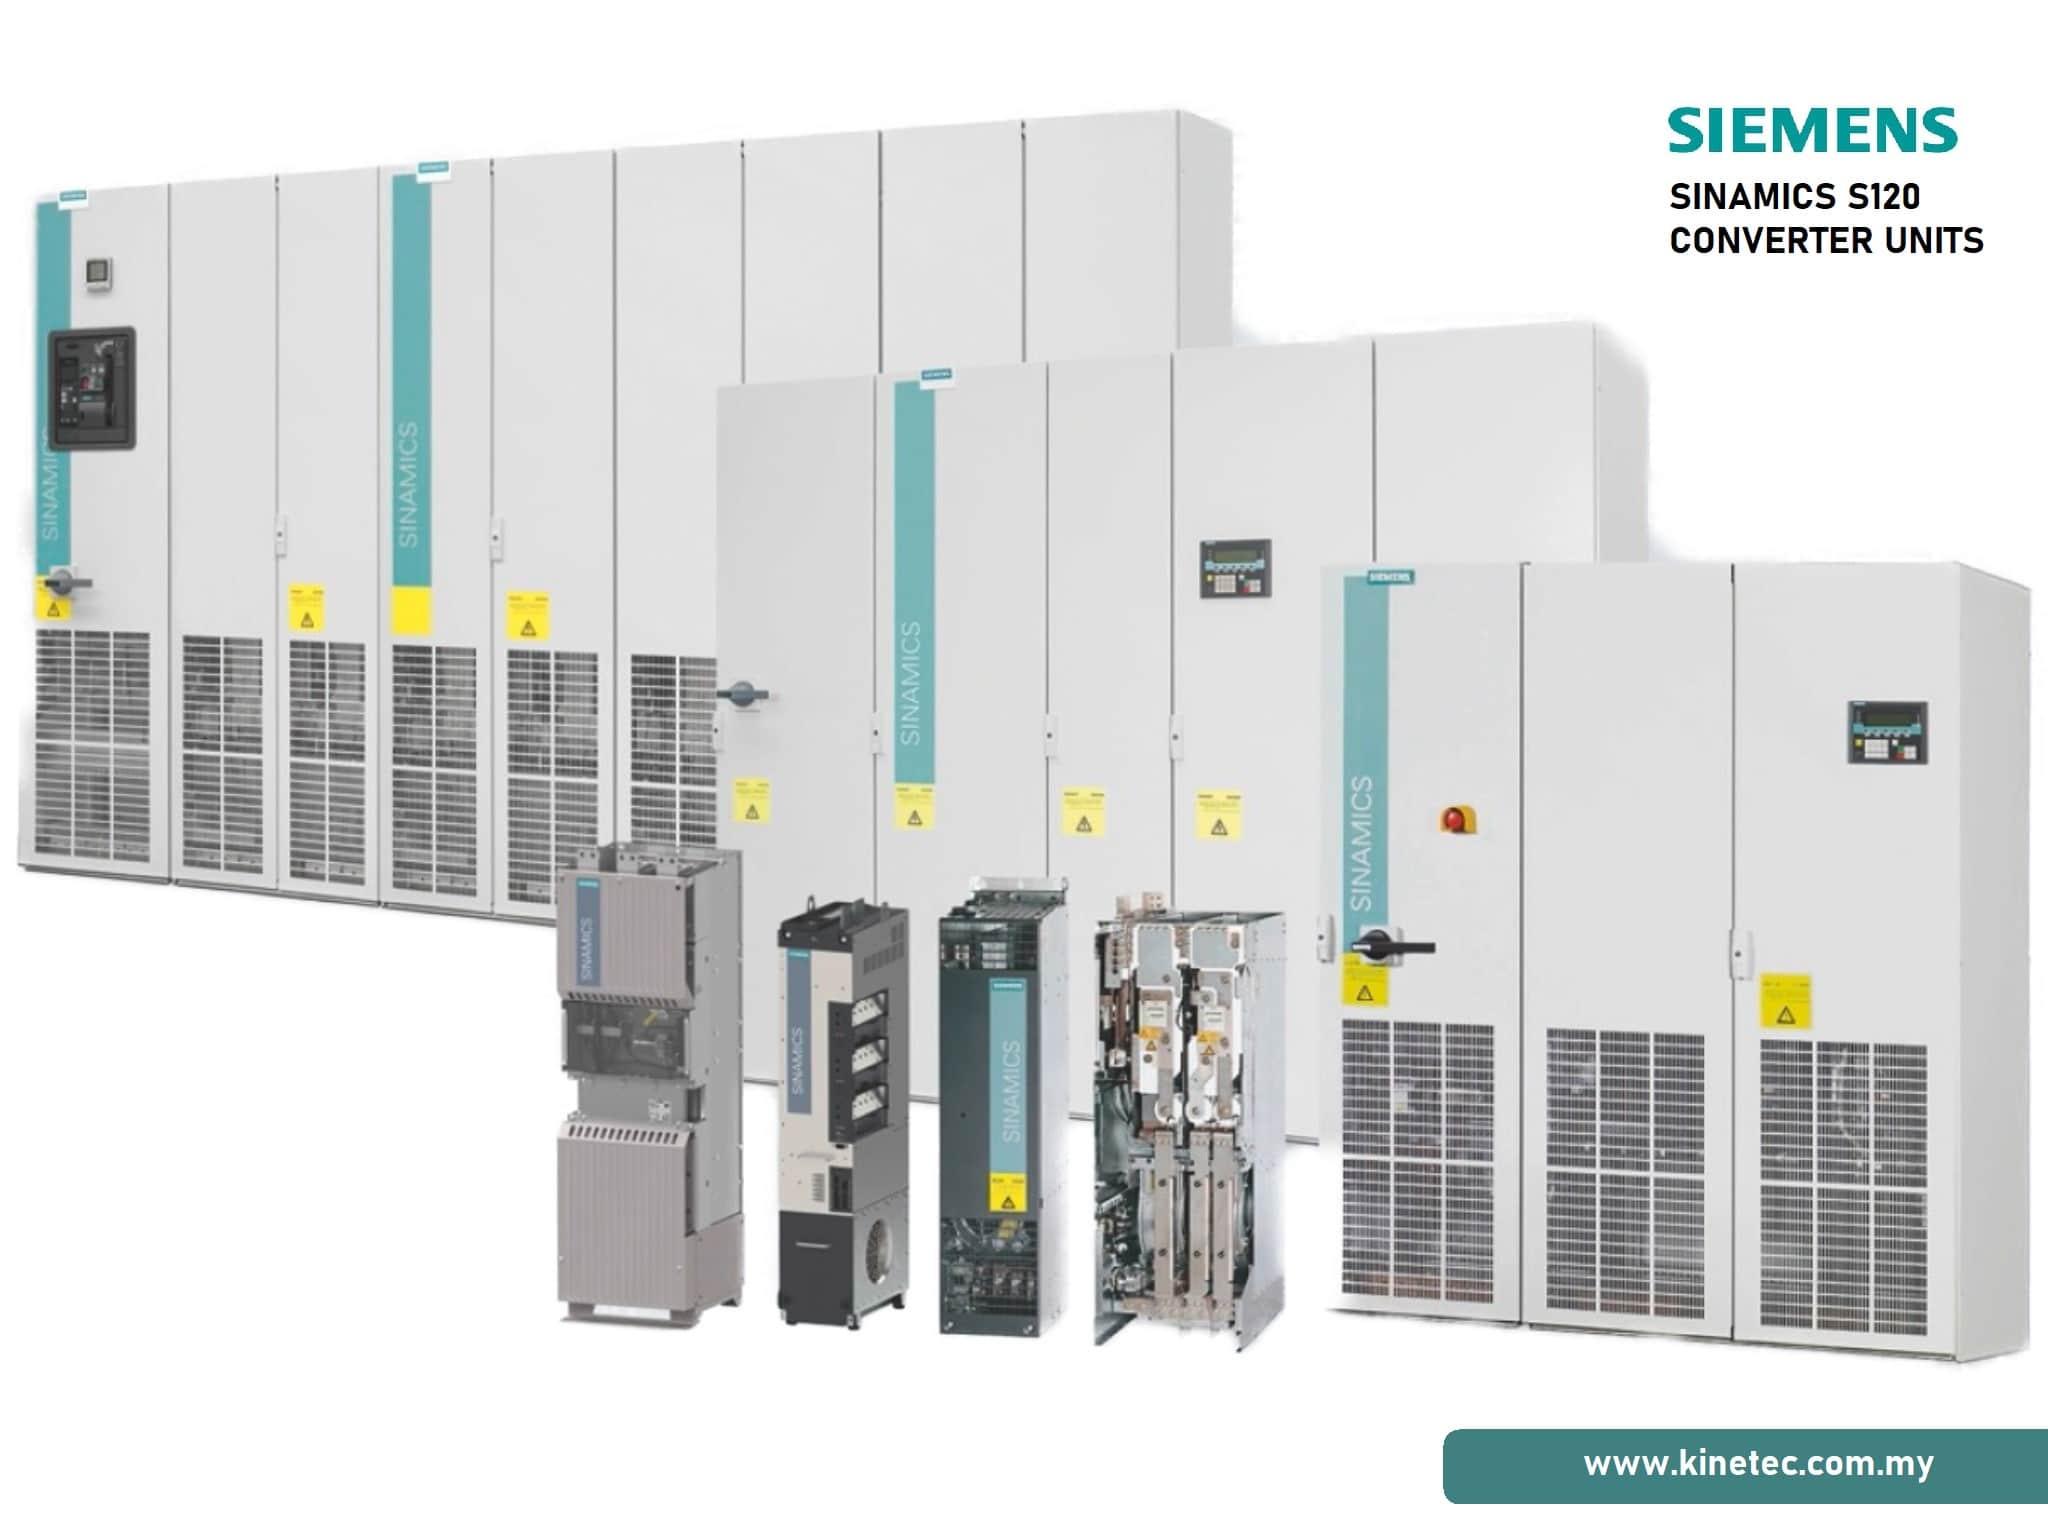 Siemens Sinamics Motor Module Malaysia | Siemens Sinamics S120 Malaysia